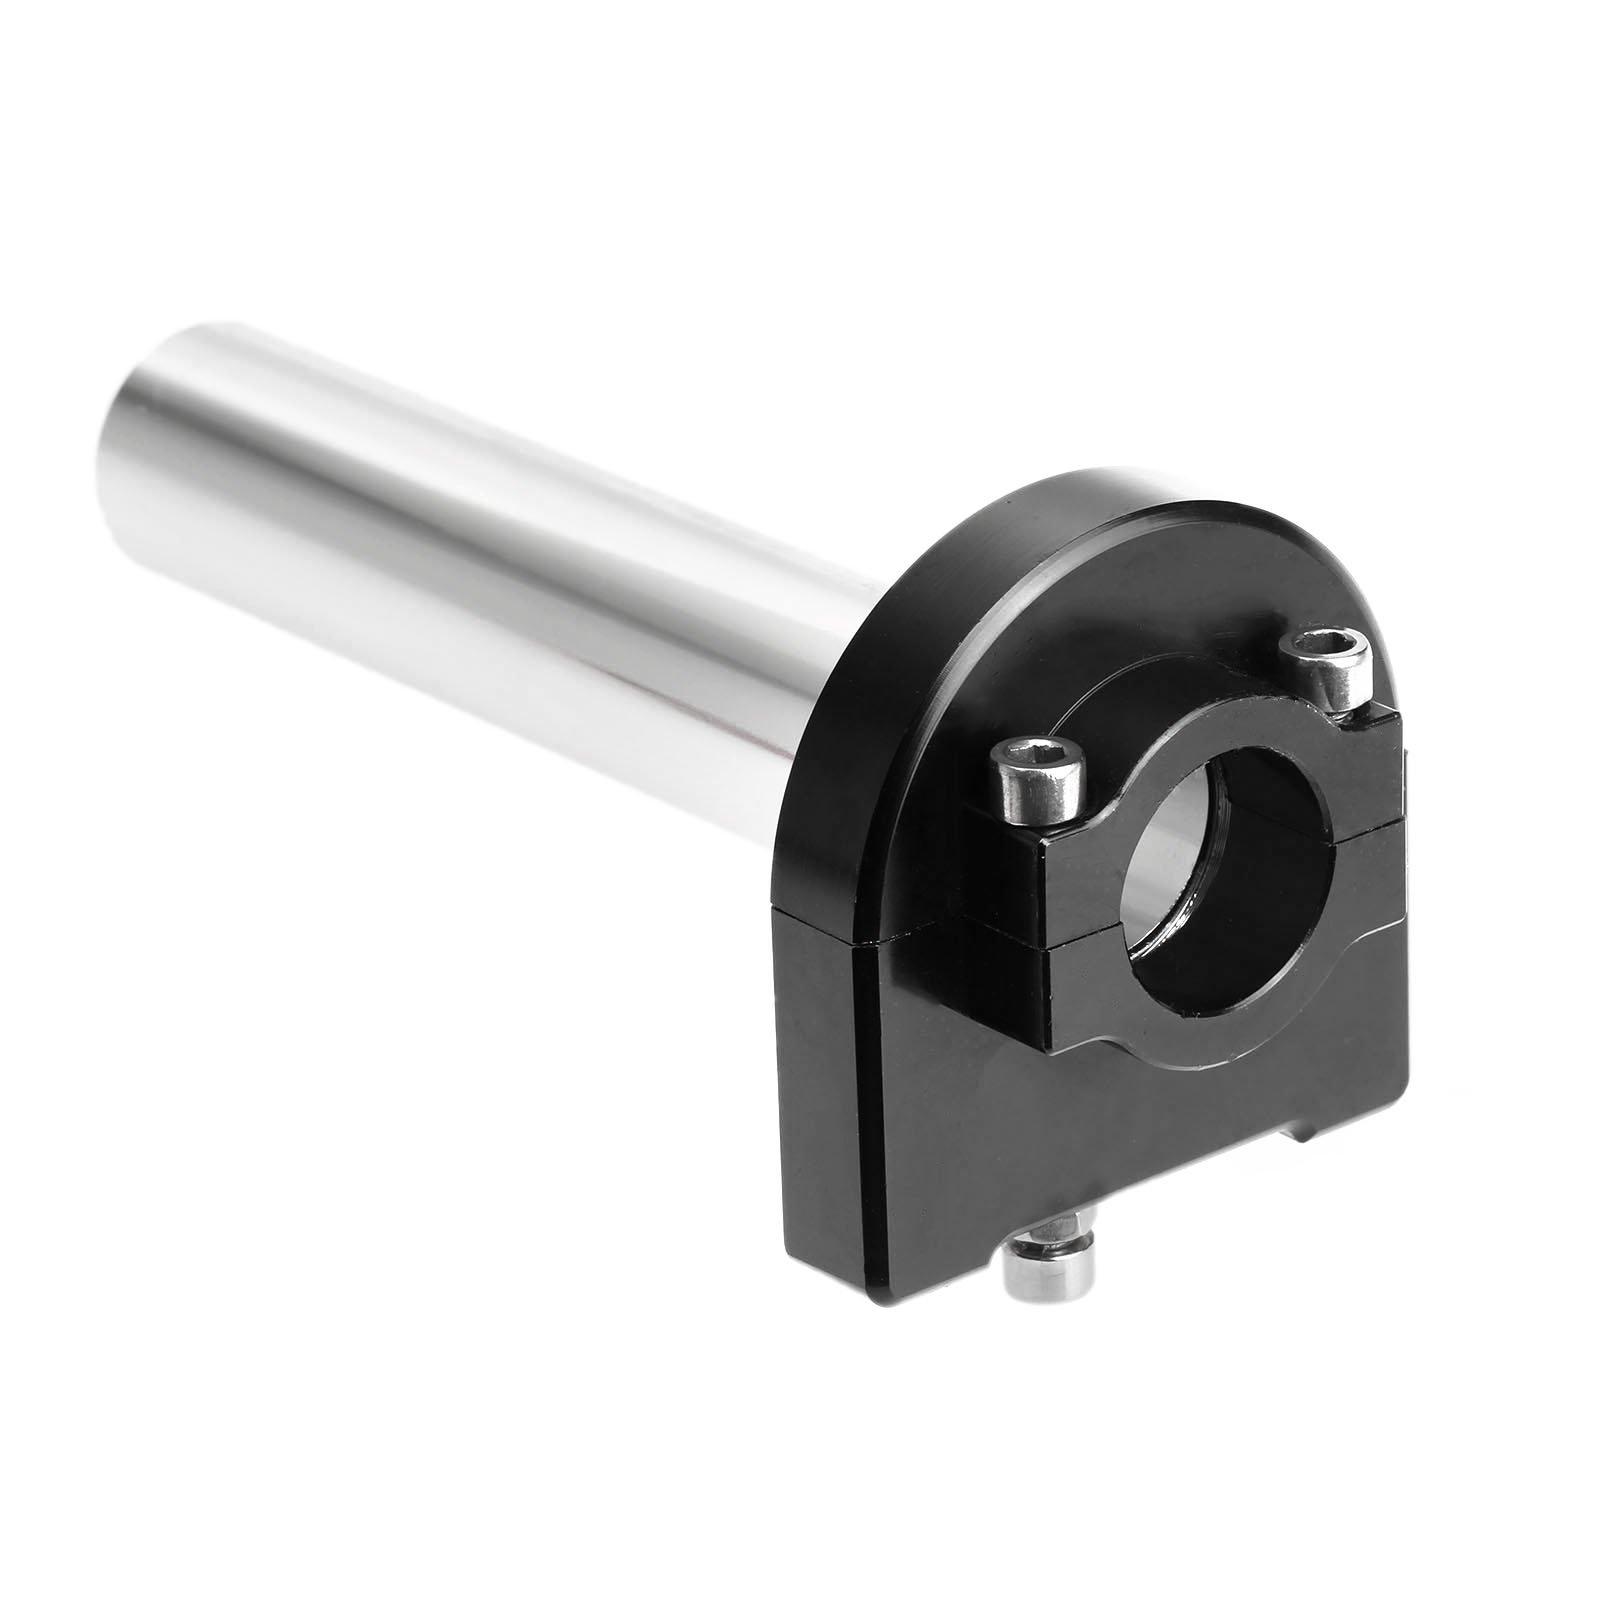 Mtsooning 1Pc Black 7/8 CNC Aluminum Hand Grips Throttle Tube for Honda, Kawasaki, Suzuki, Yamaha, KTM